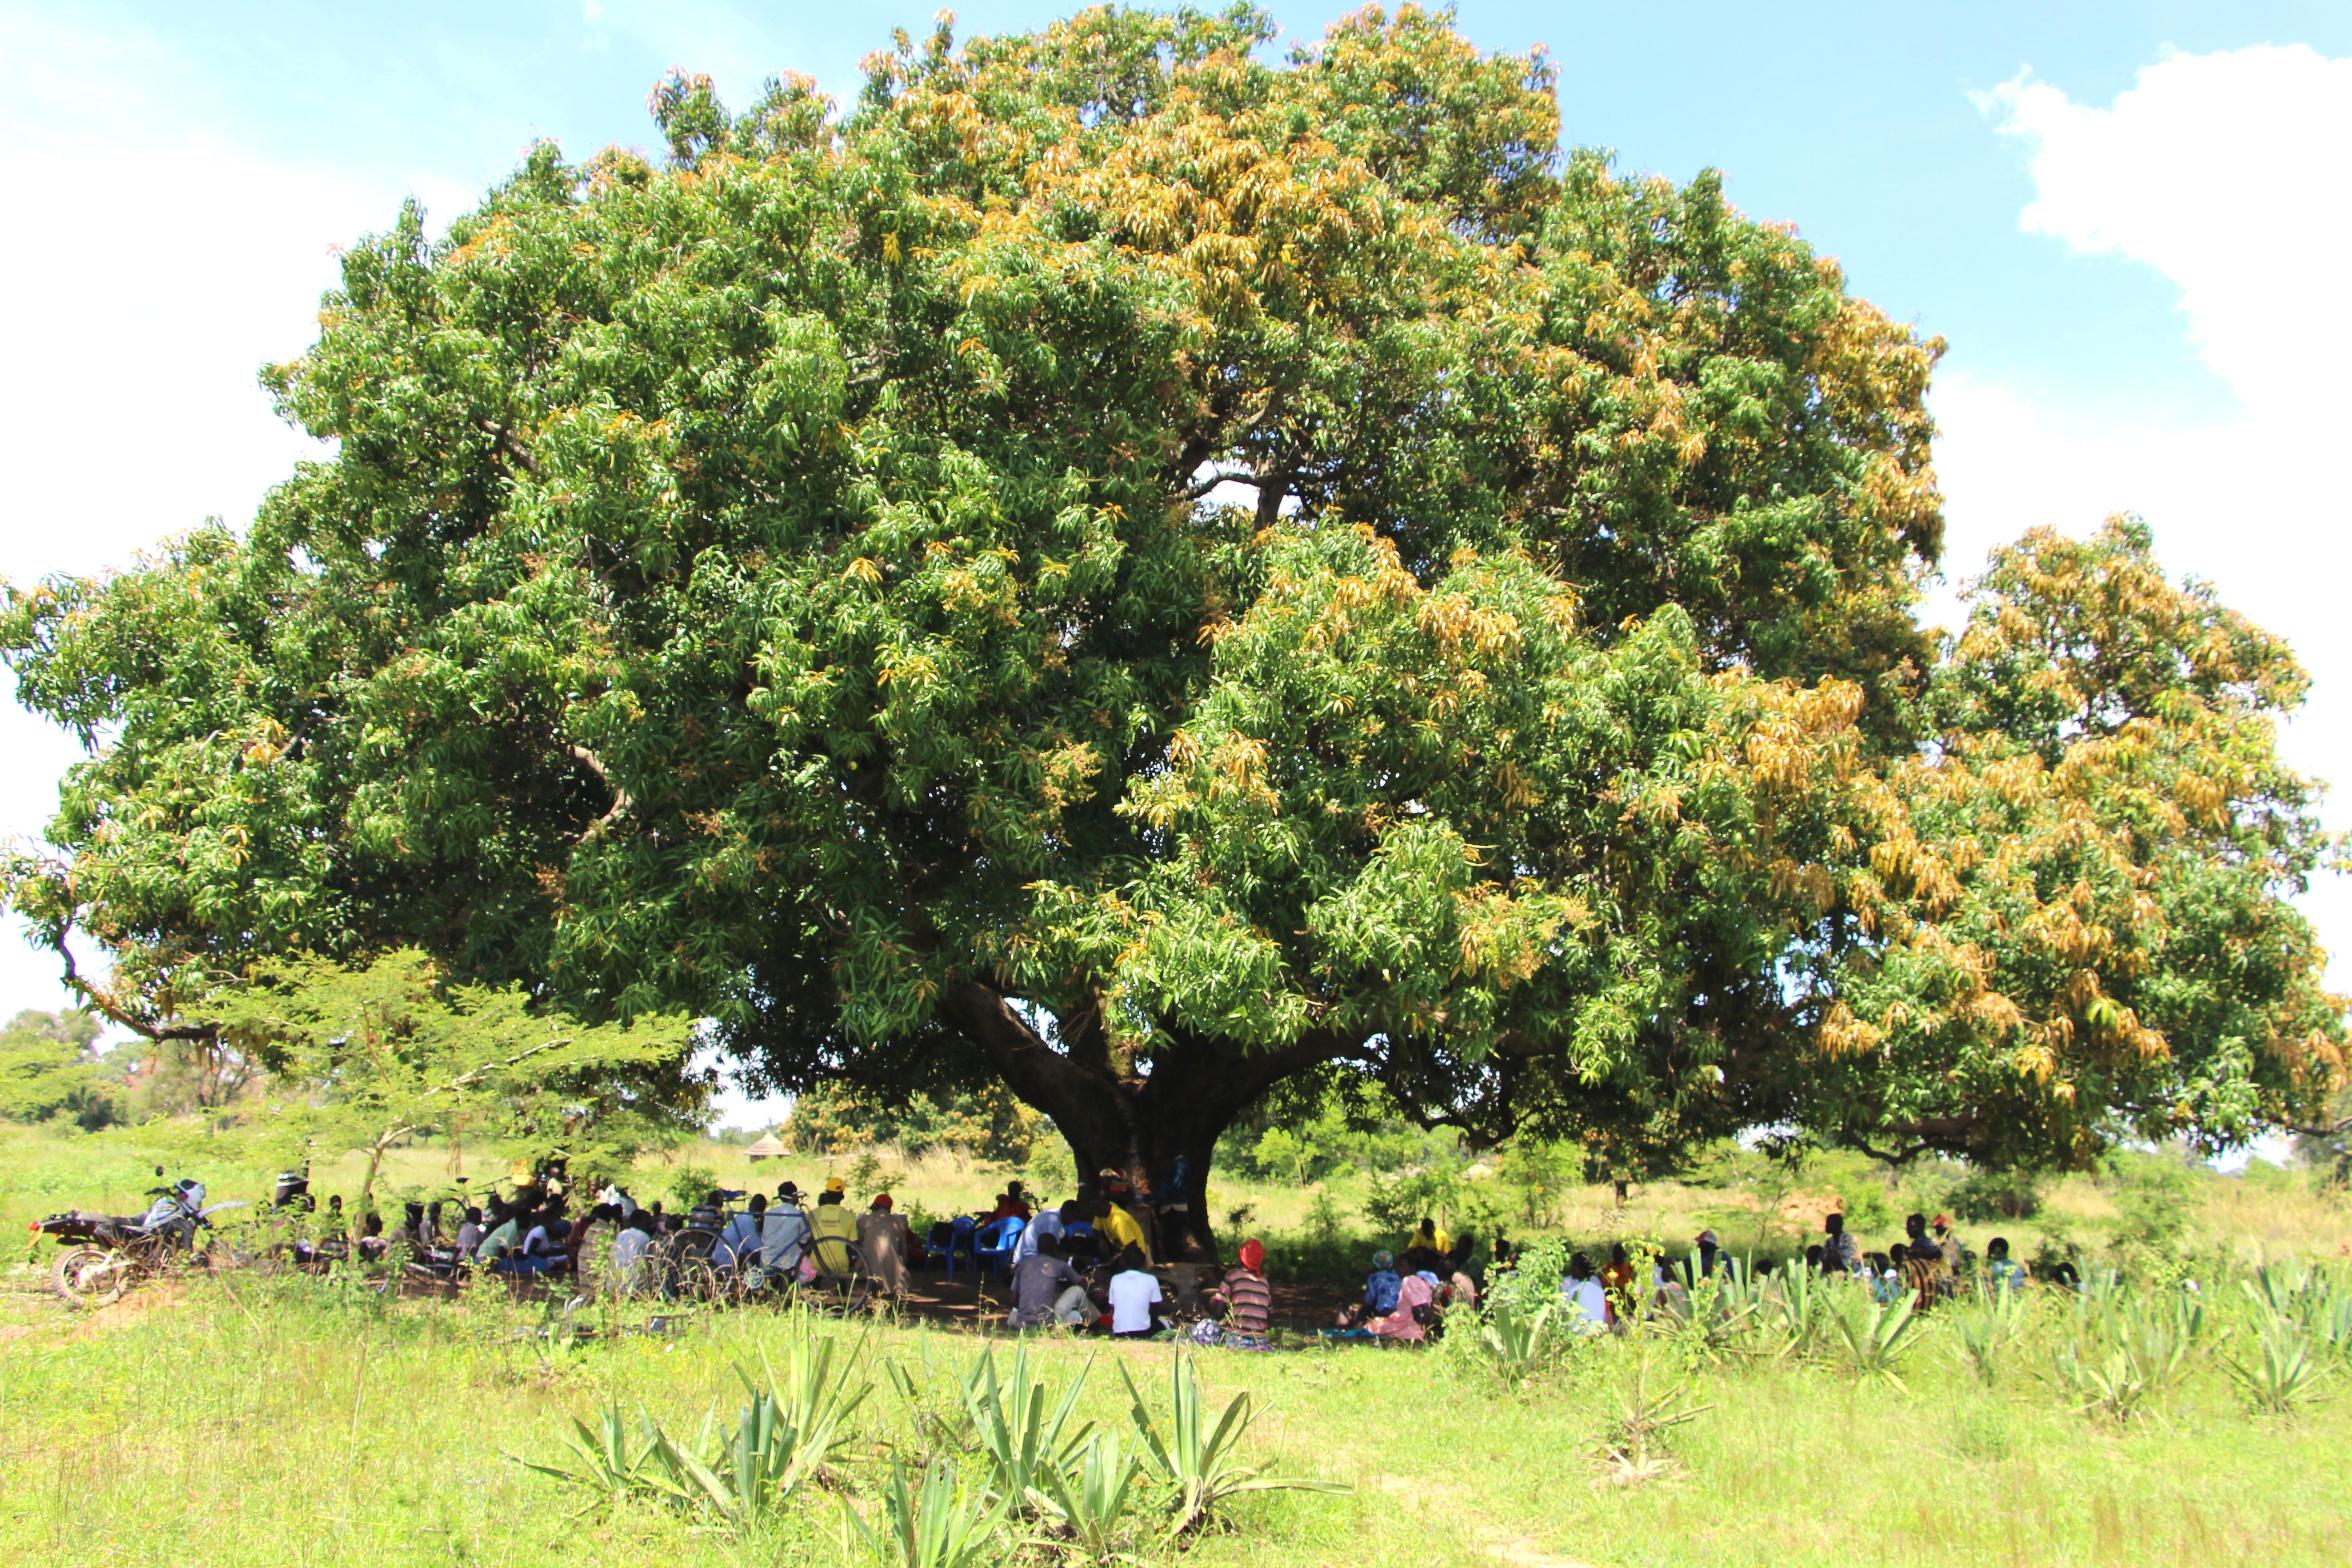 Village Enterprise Business Owners under a tree in Akisim, Uganda.